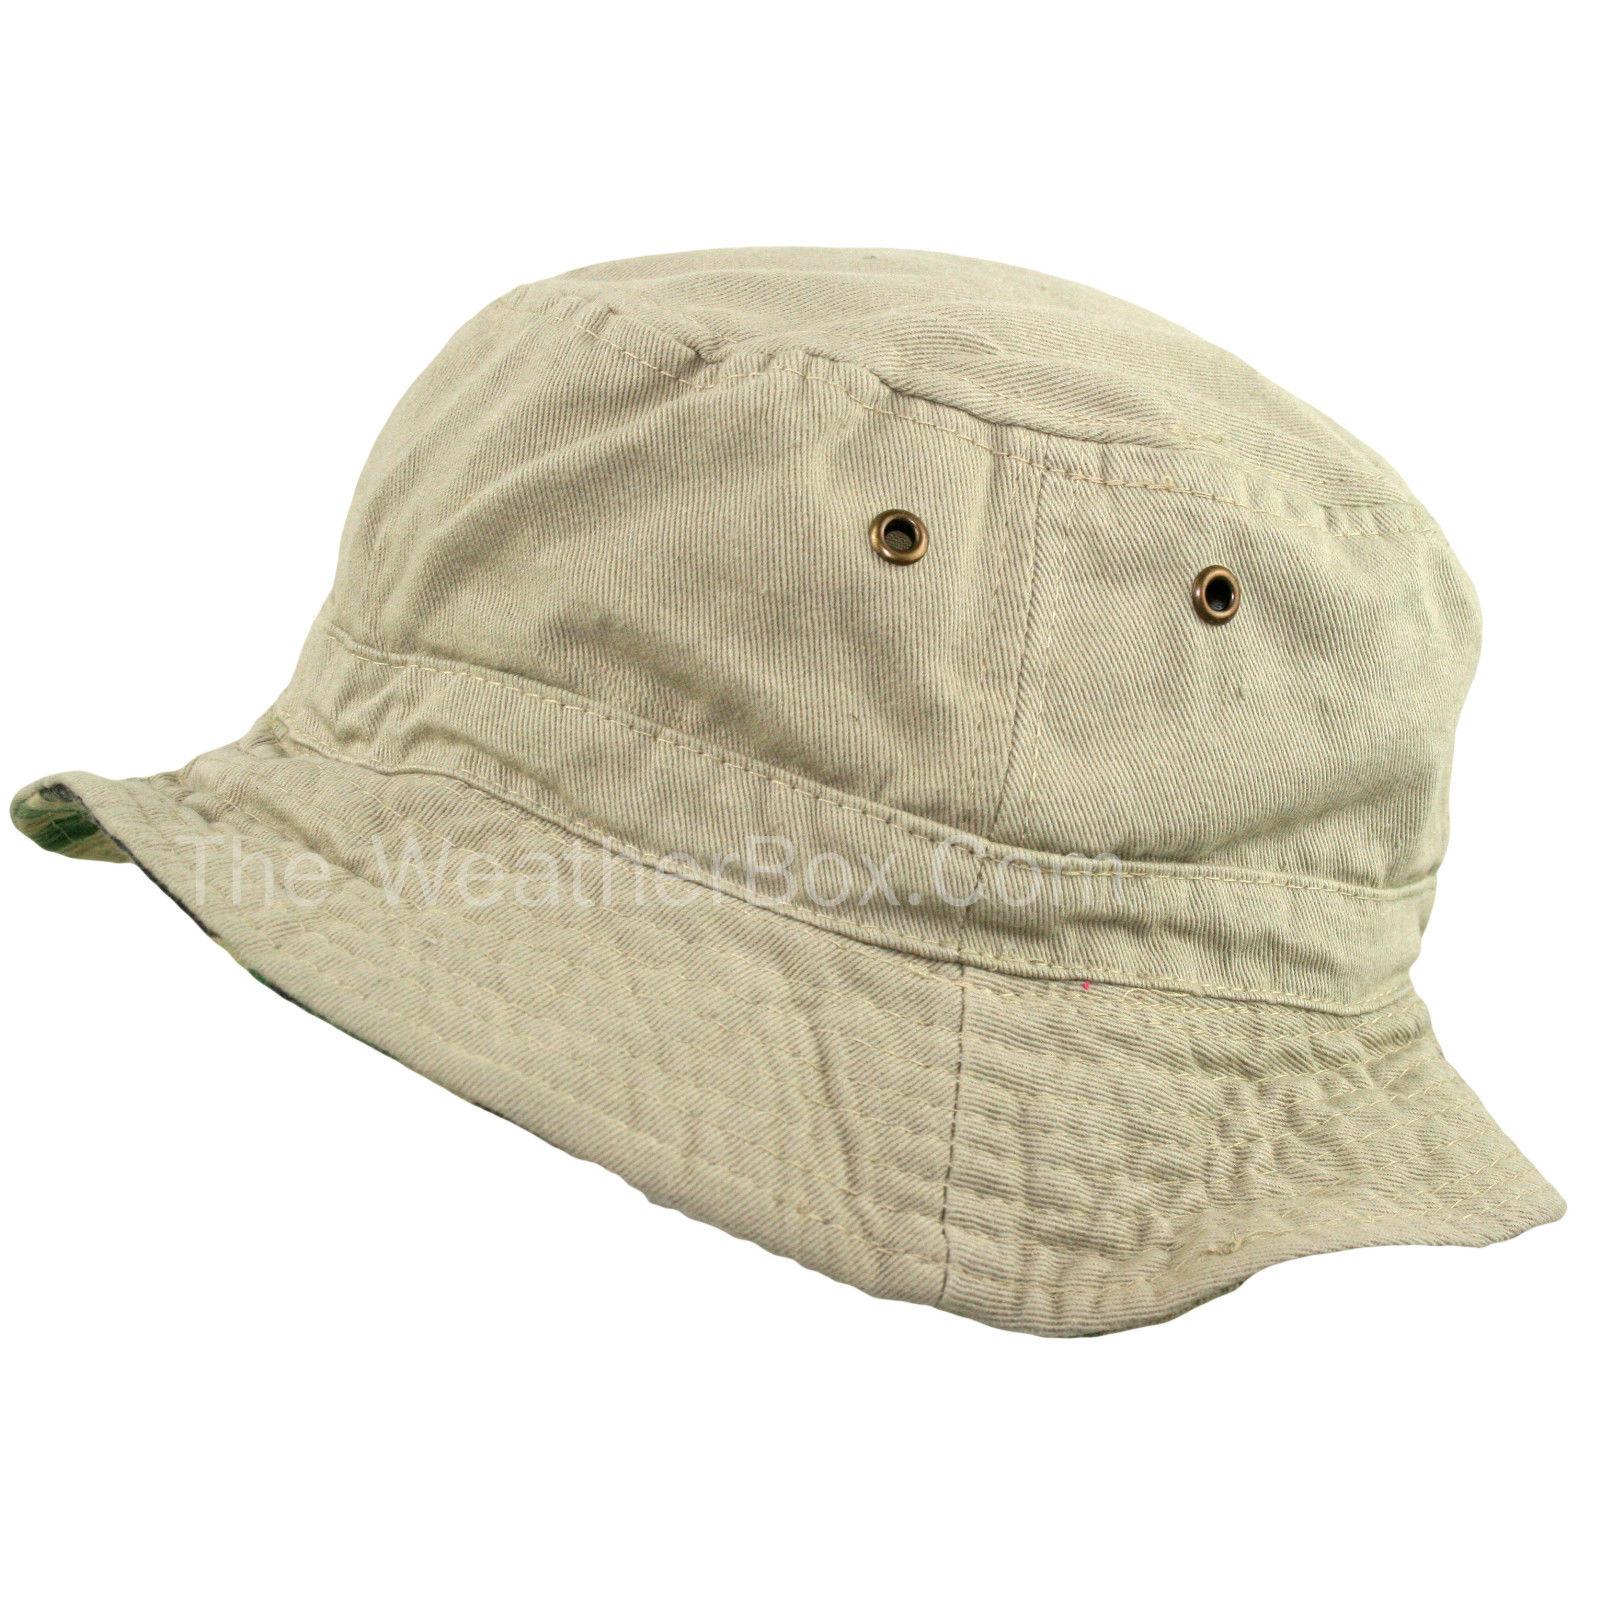 Camouflage beige bush hat mens ladies summer sun fishing for Fishing boonie hat